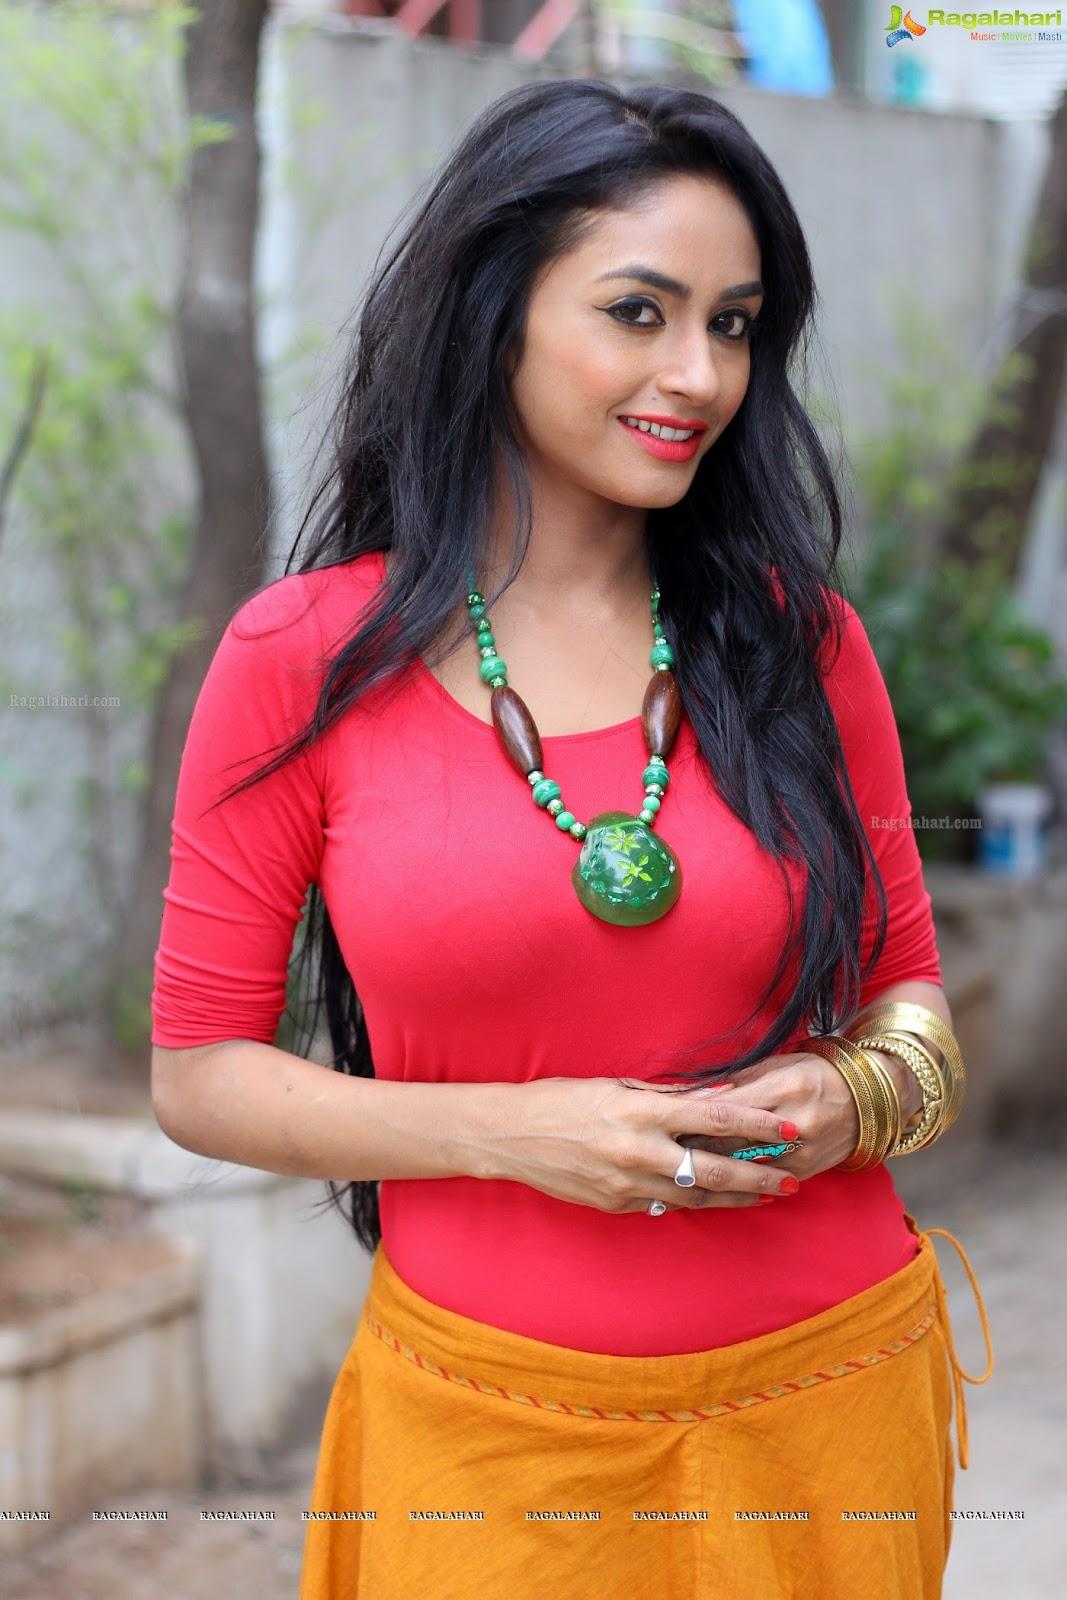 sumon4all: Pooja Sri-9